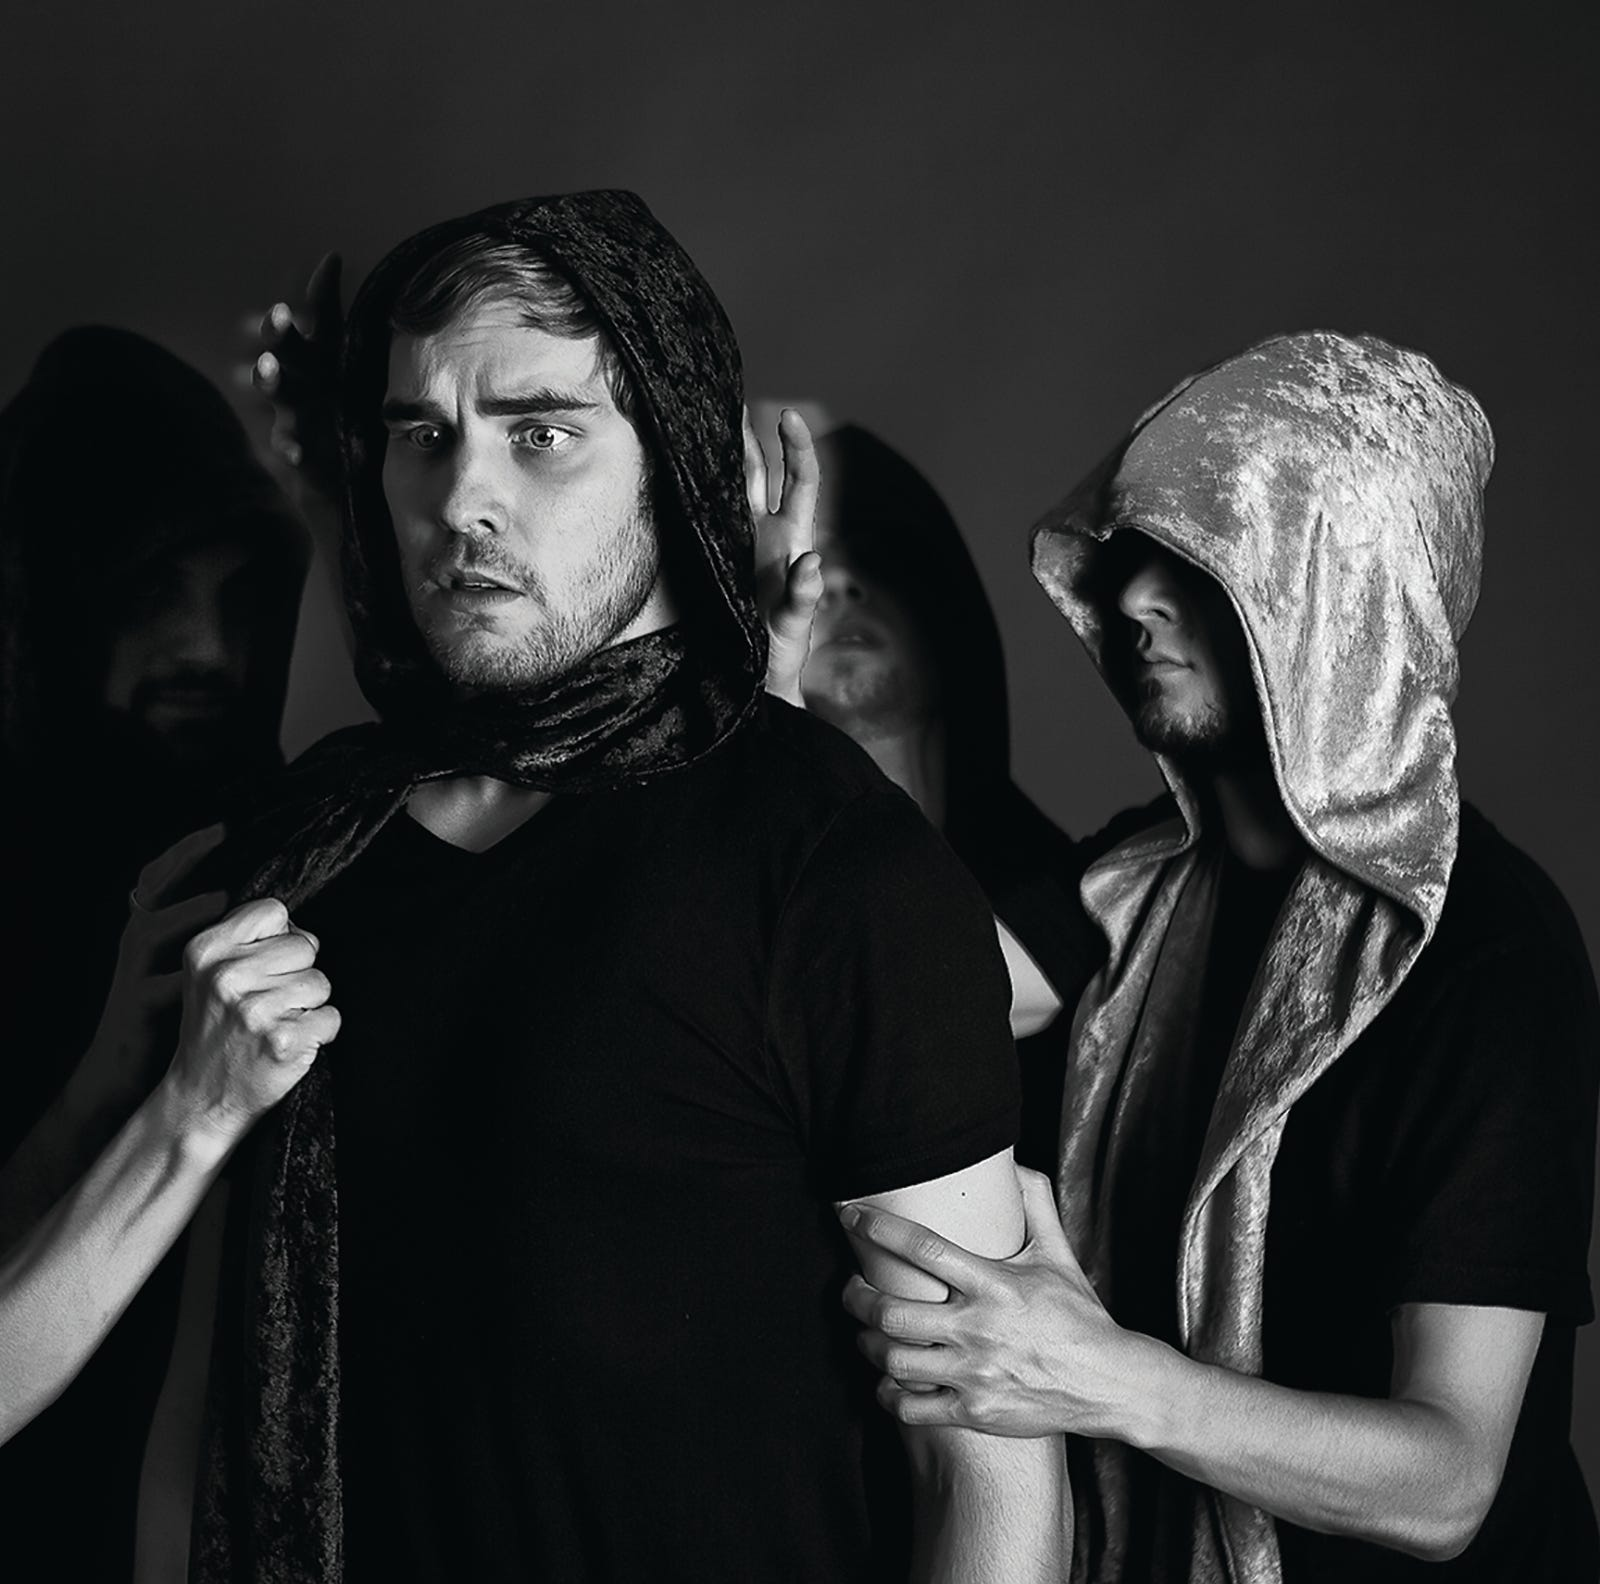 Improv Festival of Cincinnati: Cincy becoming a hotbed for improv theater